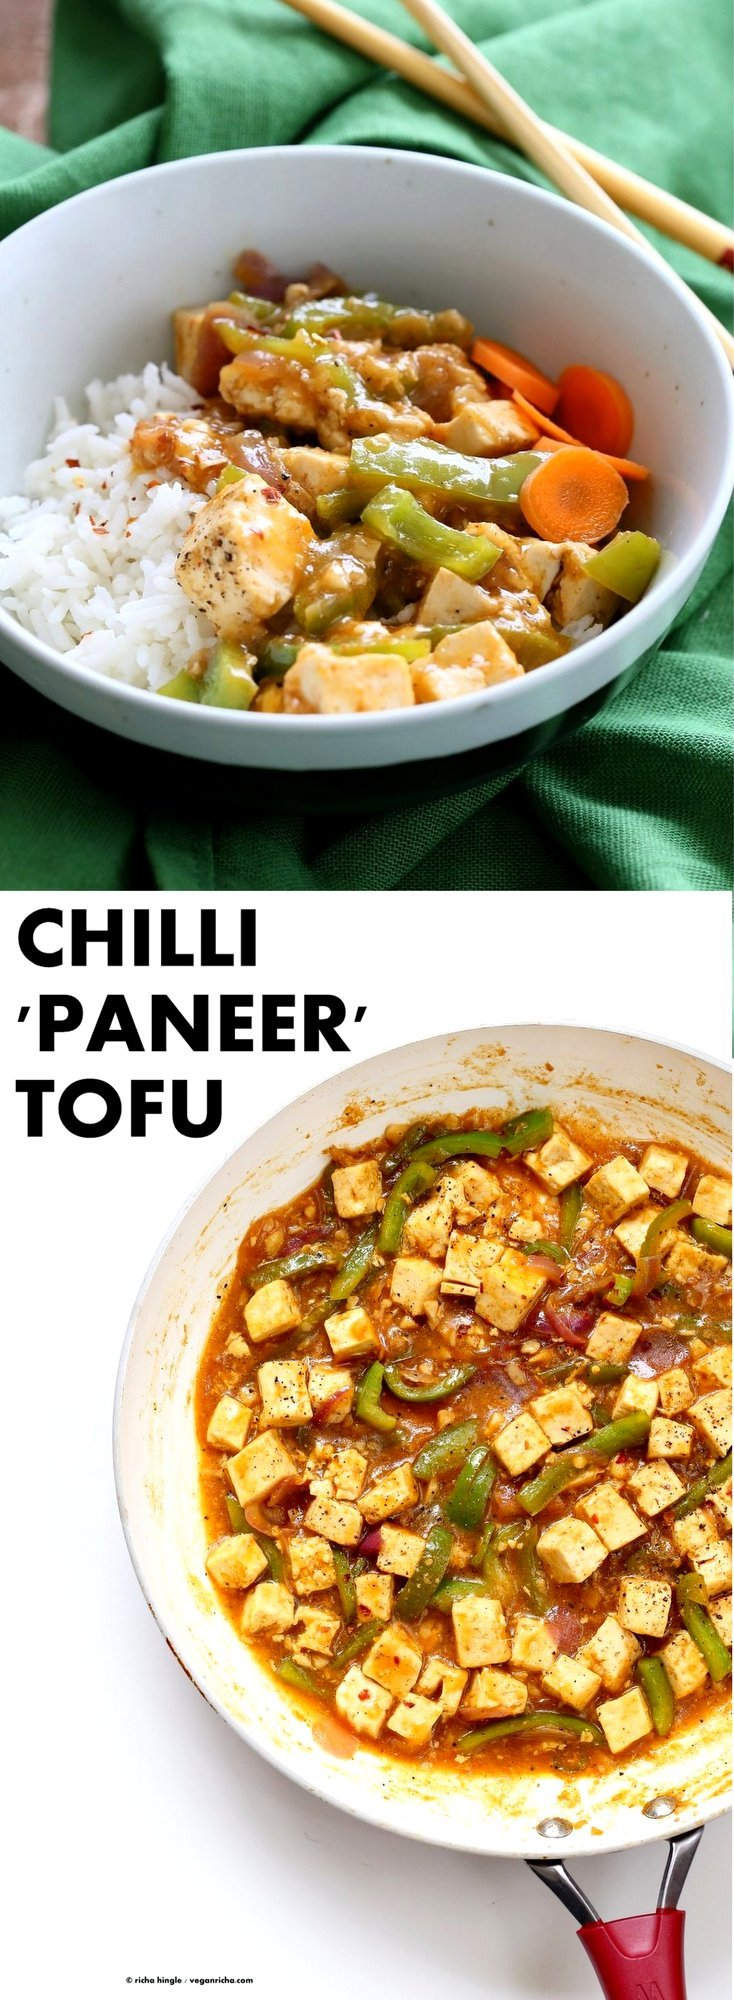 Chilli tofu indian chilli paneer recipe vegan richa chilli tofu indian chilli paneer recipe chilli paneer is an indo forumfinder Images